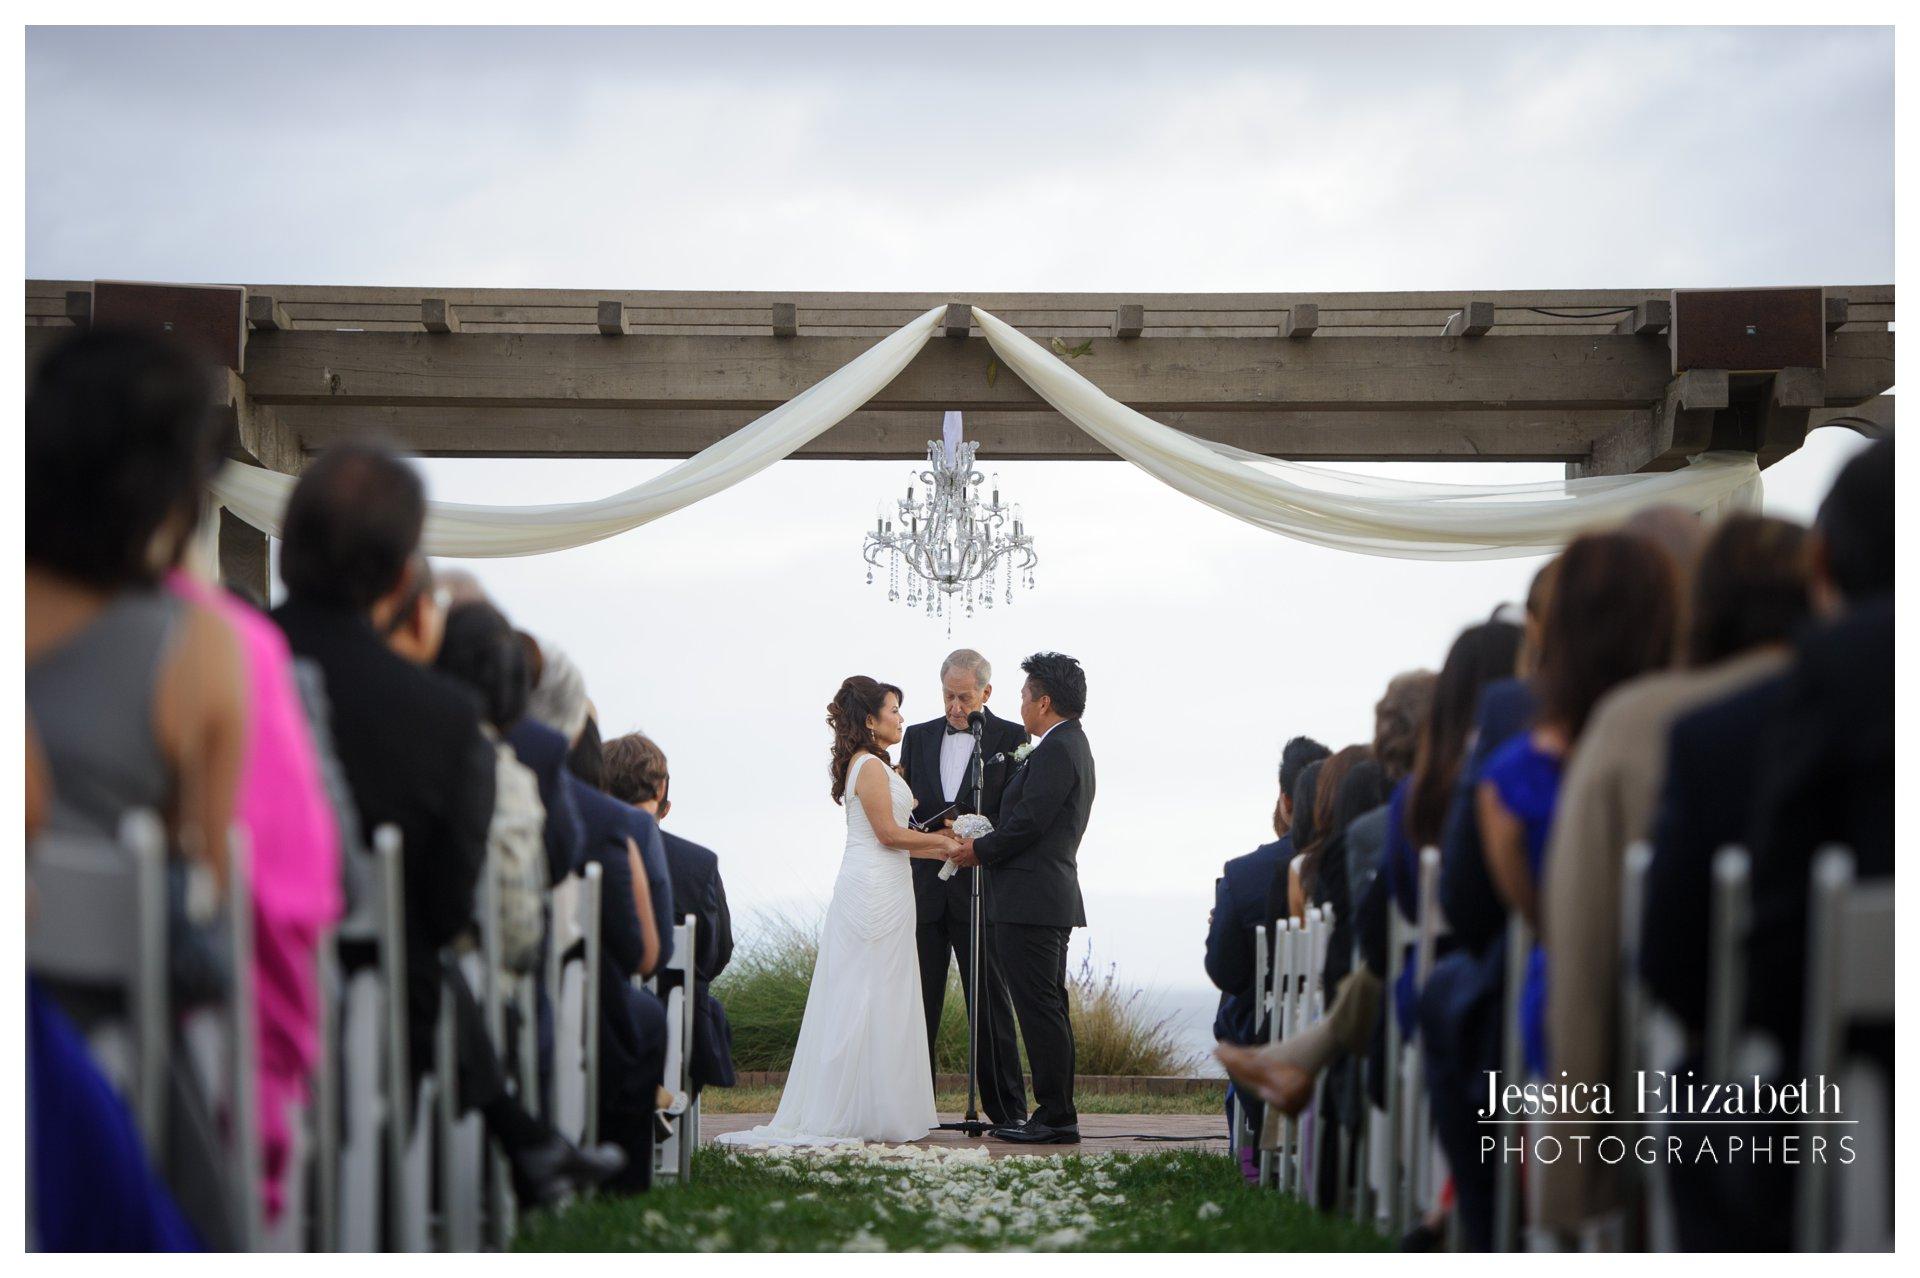 12-Terranea-Palos-Verdes-Wedding-Photography-by-Jessica-Elizabeth-w.jpg